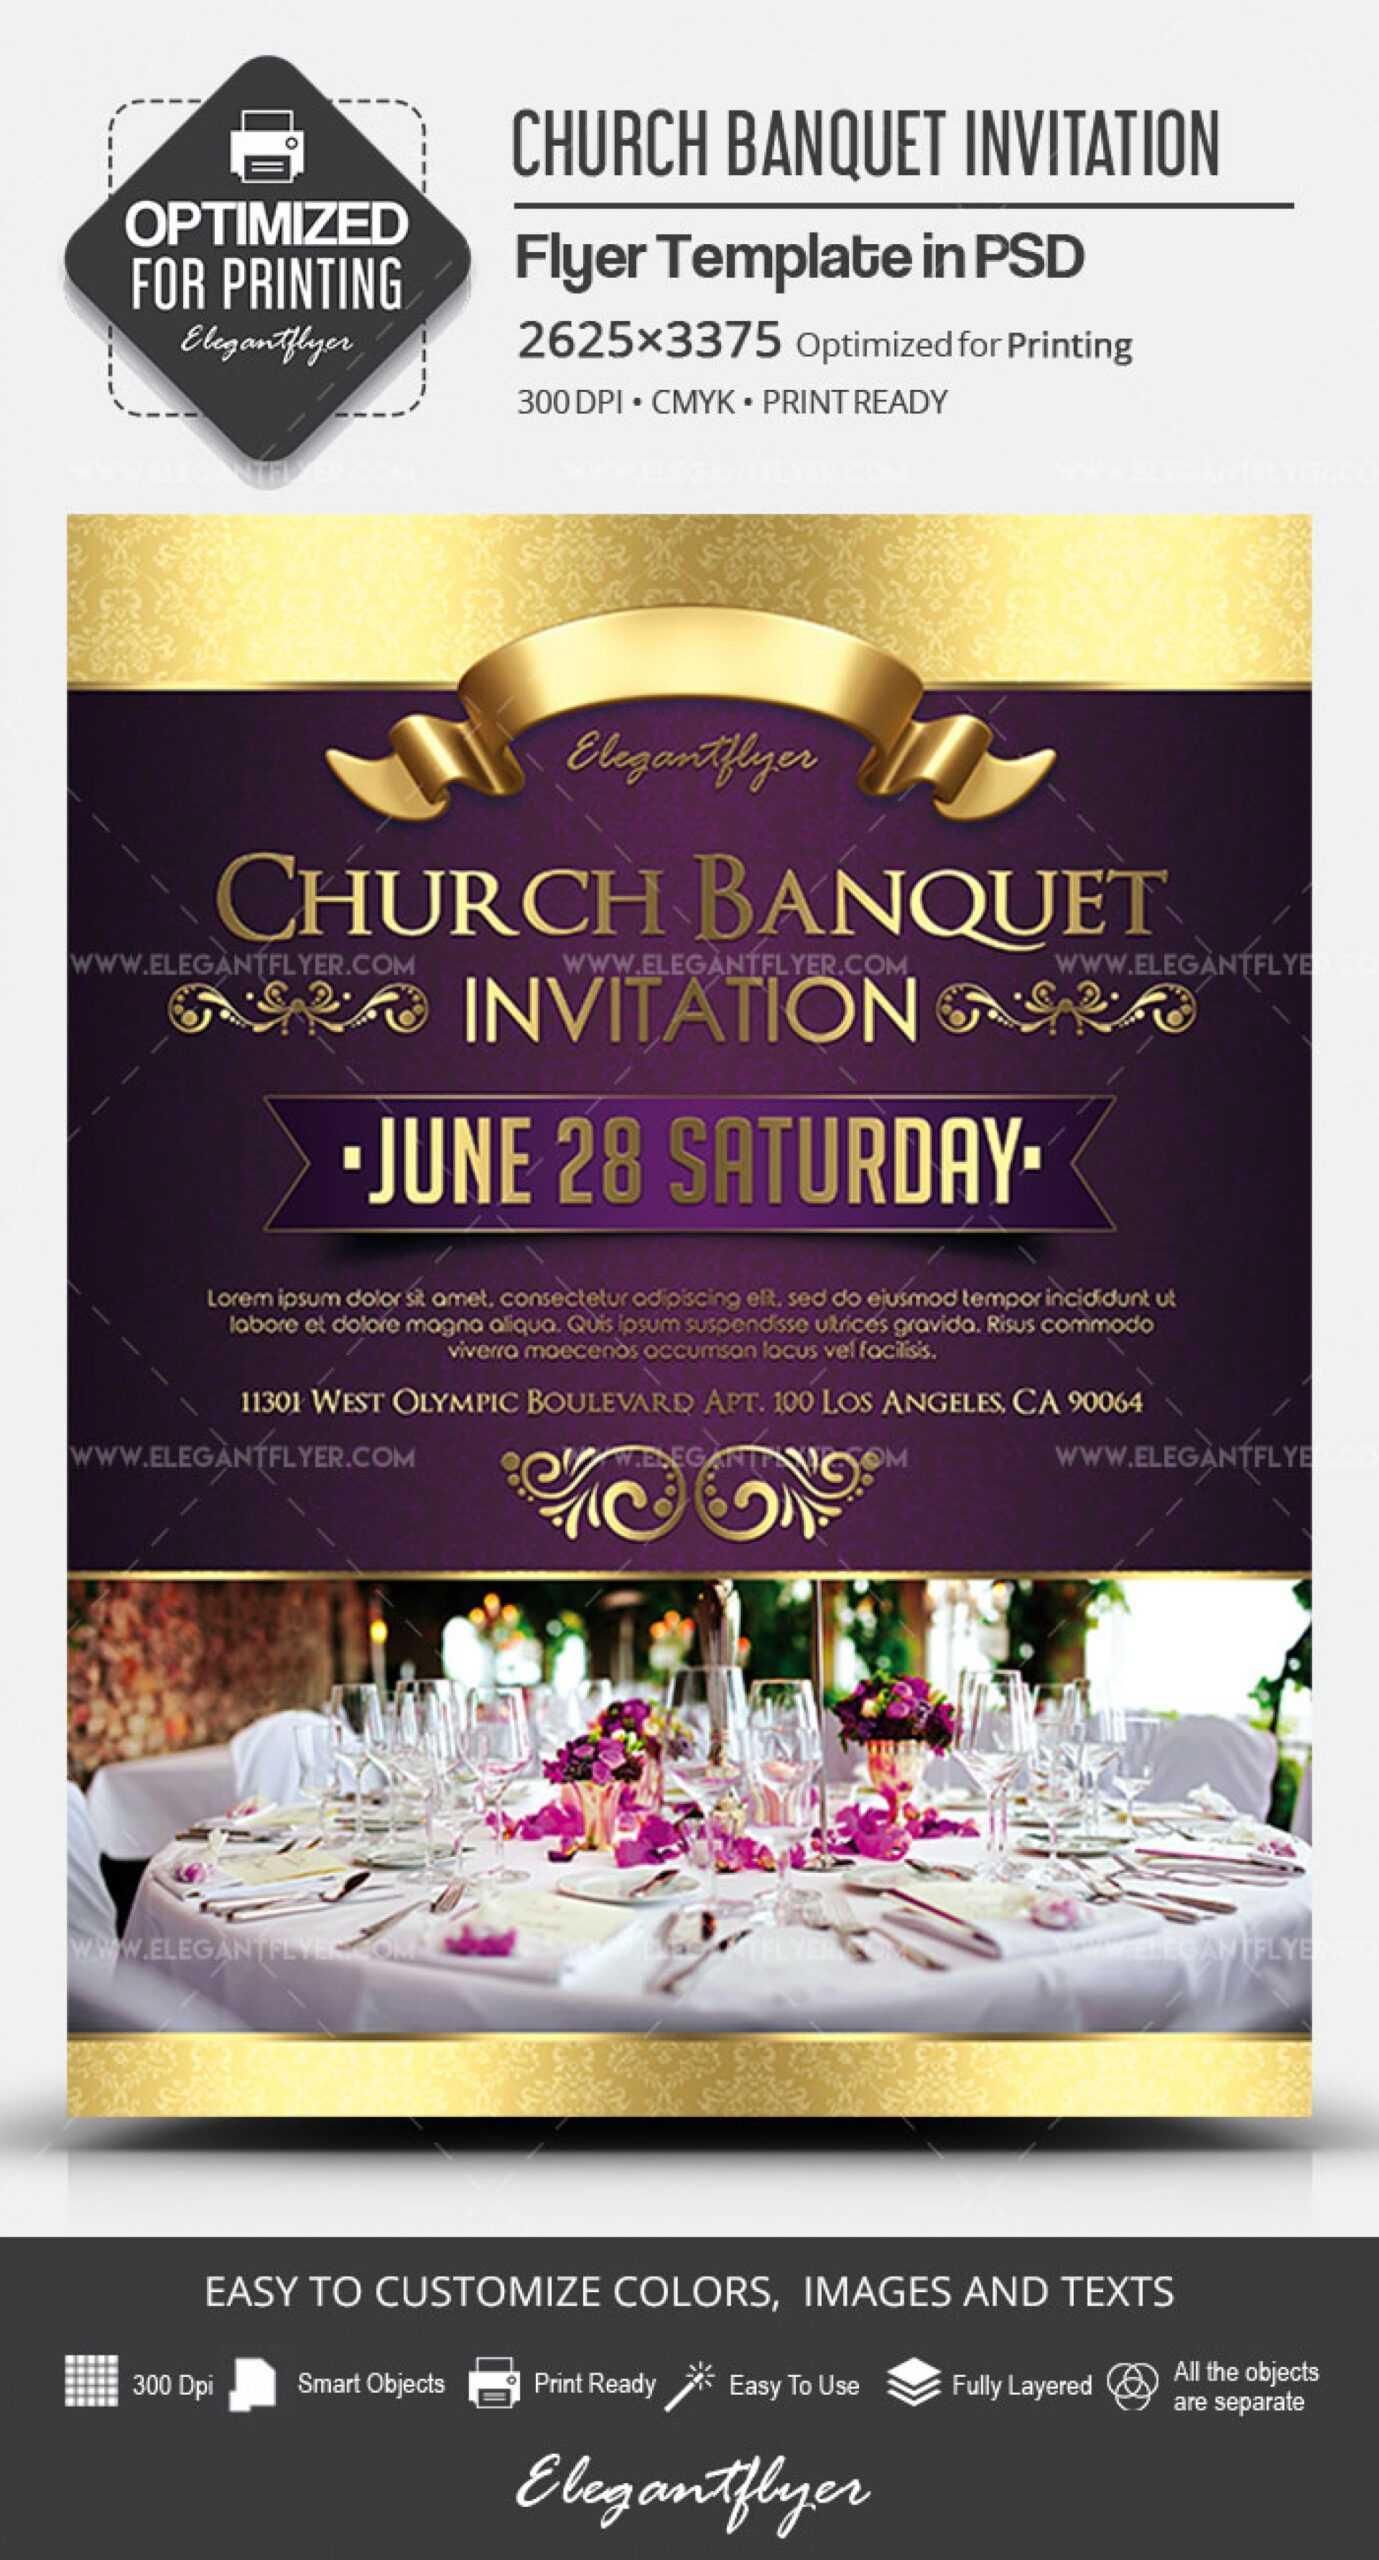 026 Church Invitation Cards Templates Pcttw14 Template Pertaining To Church Invite Cards Template